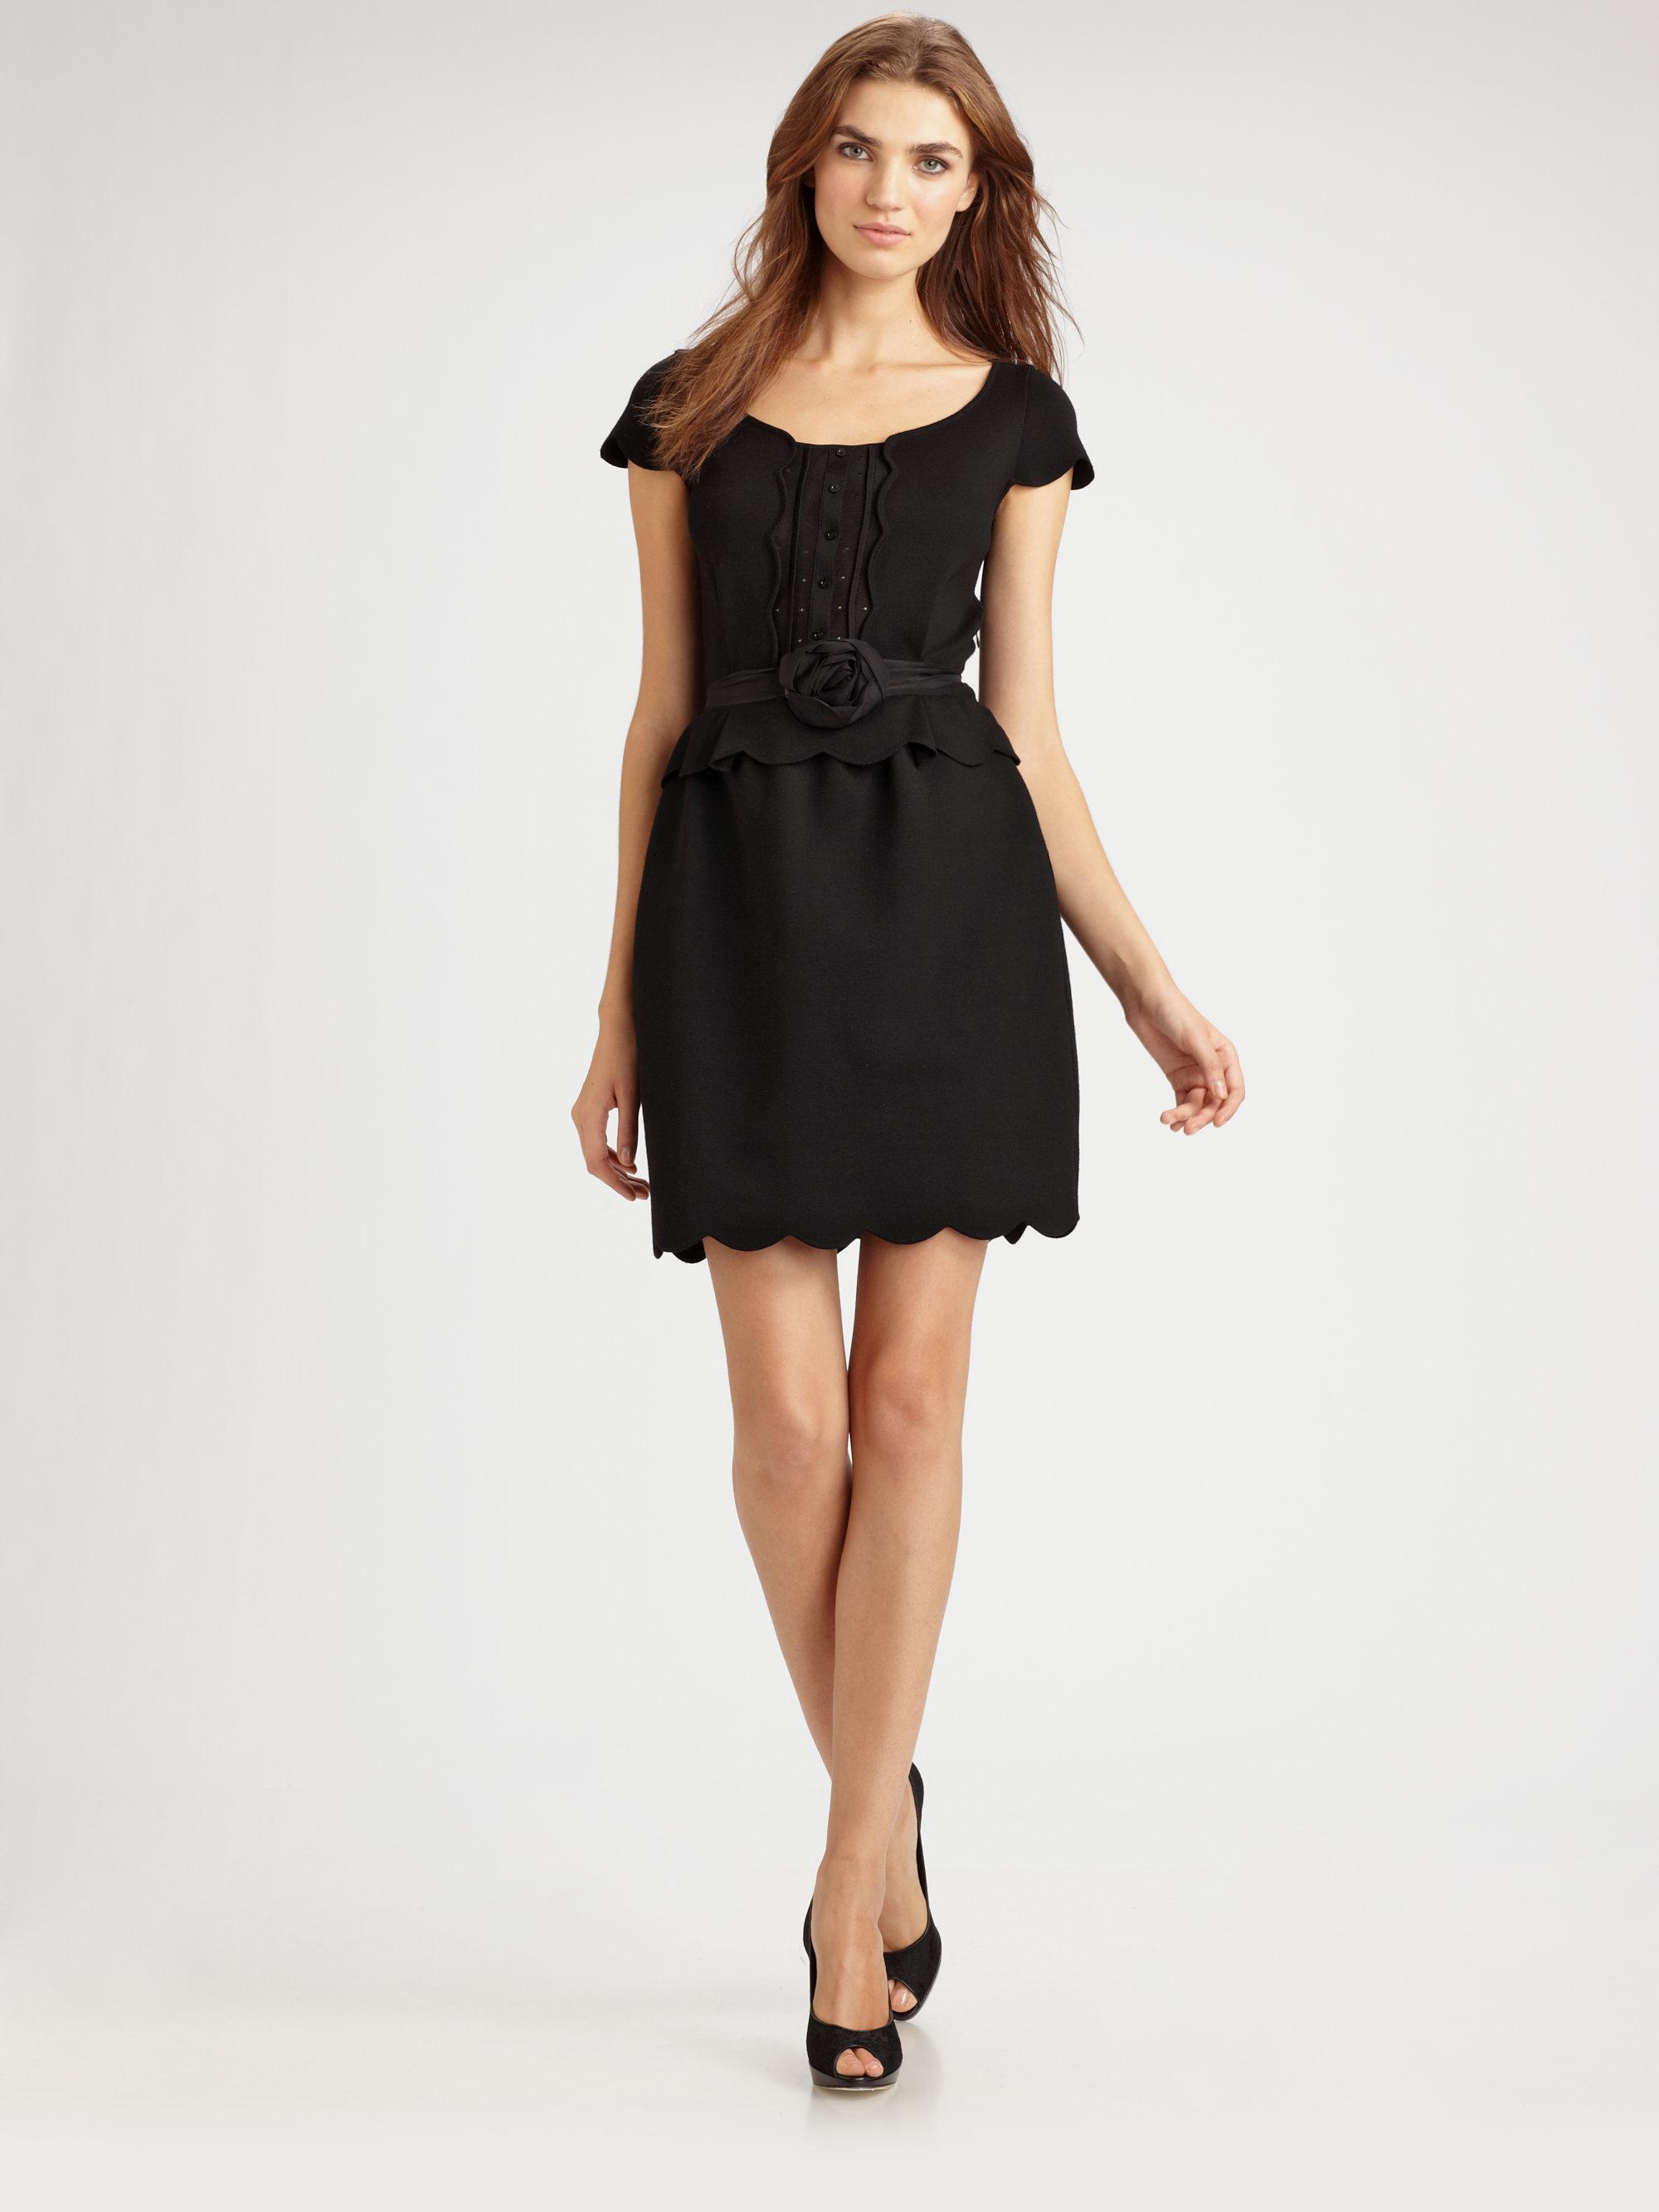 dior short dresses - photo #16